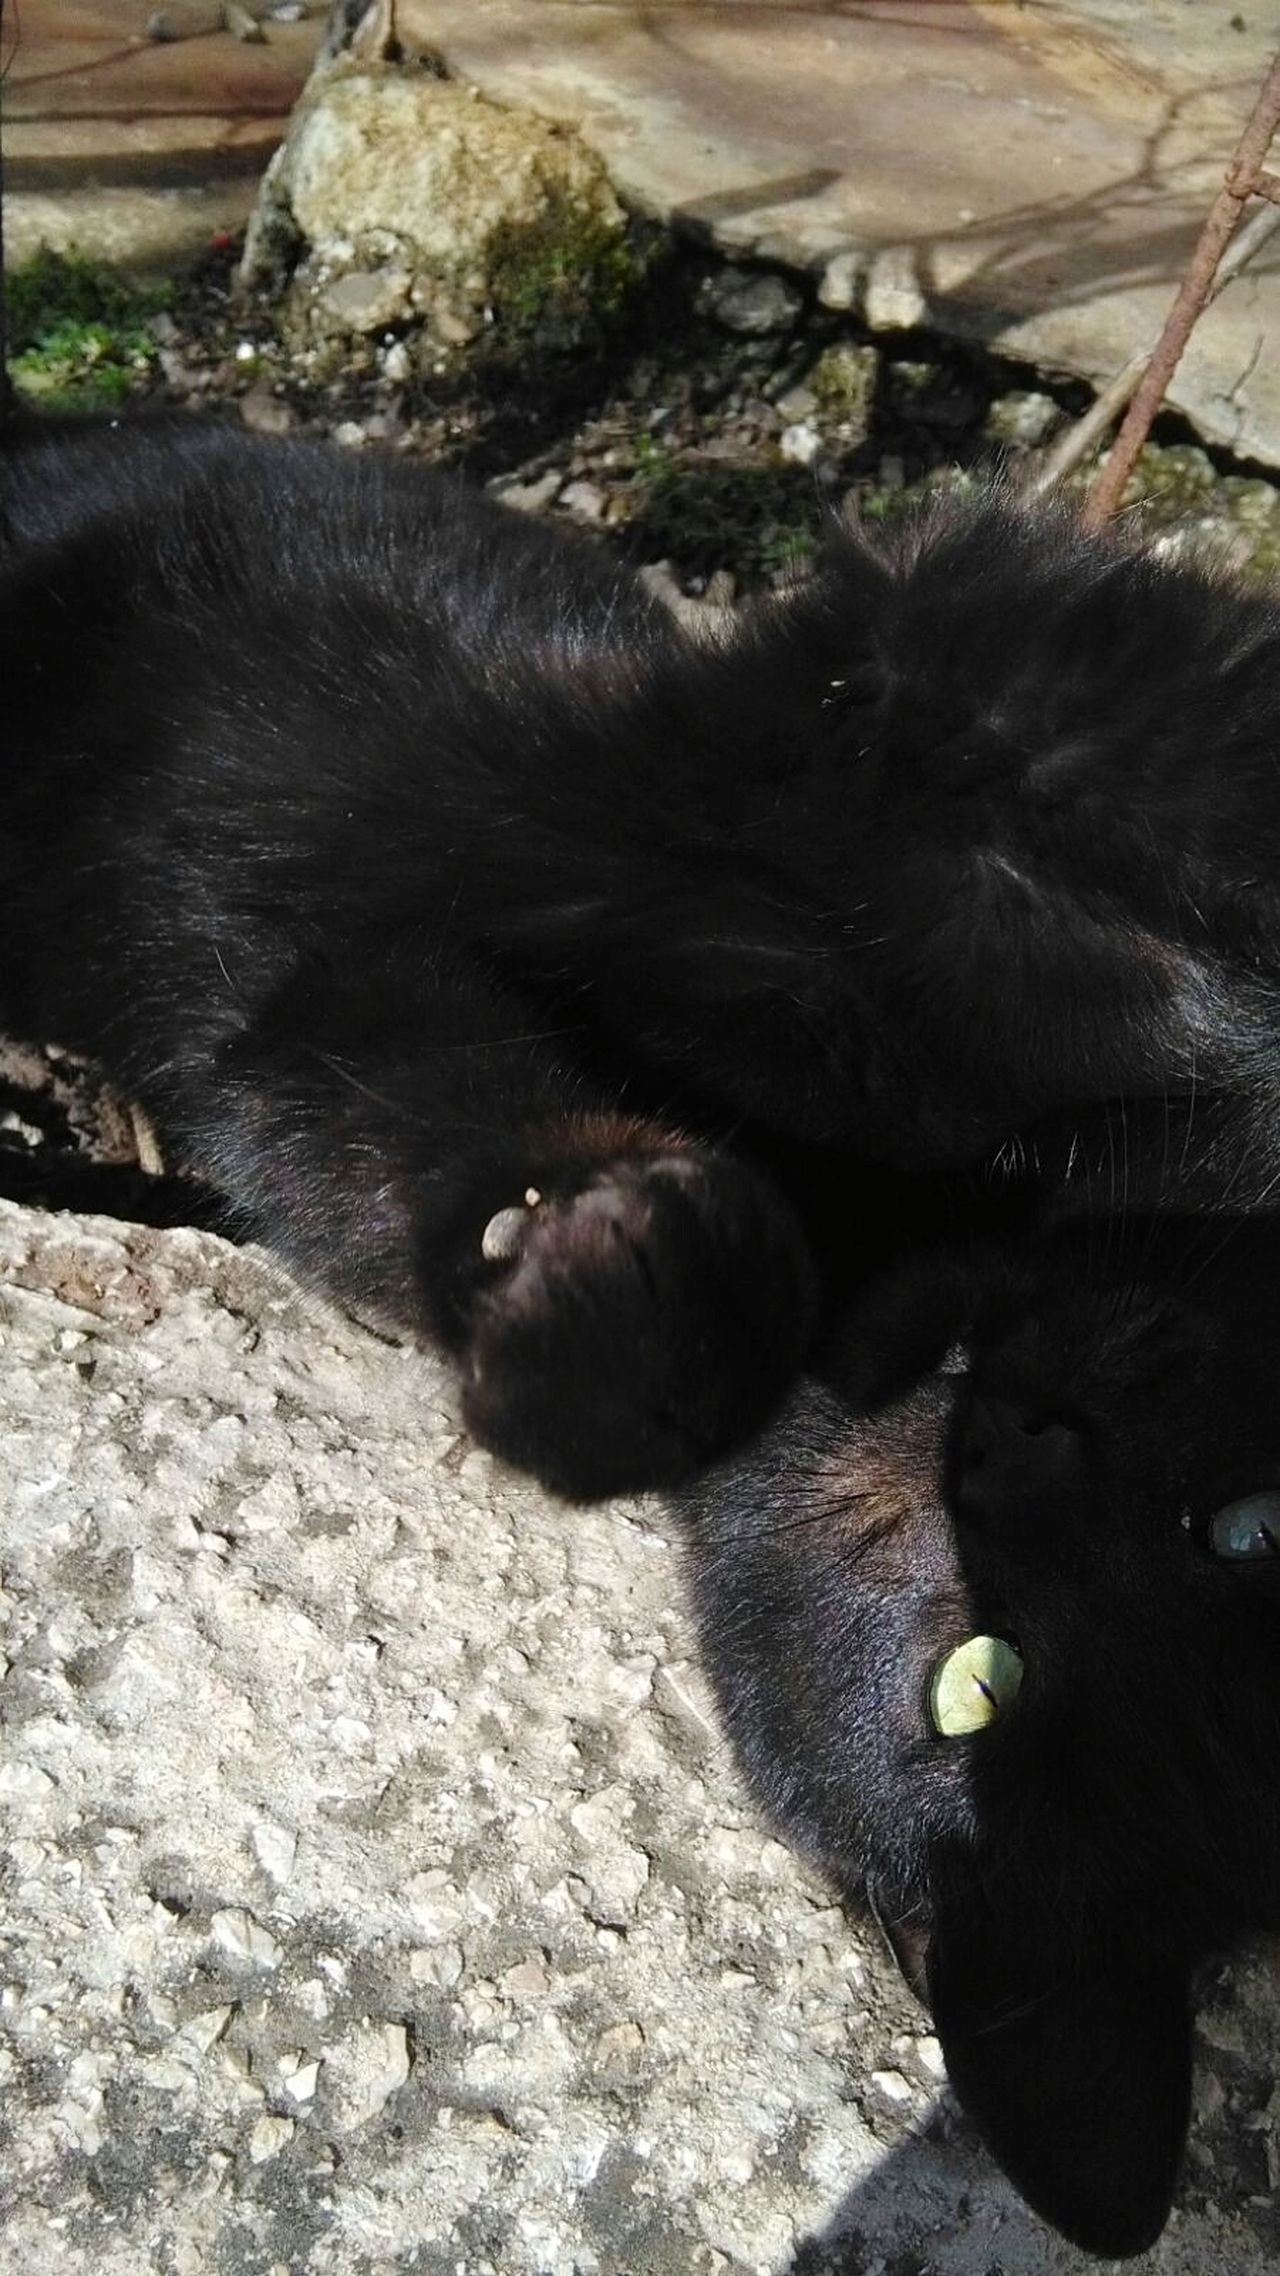 Black Cat Black Cat Photography Black Cats Black Cat Love Black Cat Curling Cat Cat Lovers Cats Of EyeEm Cat Eyes